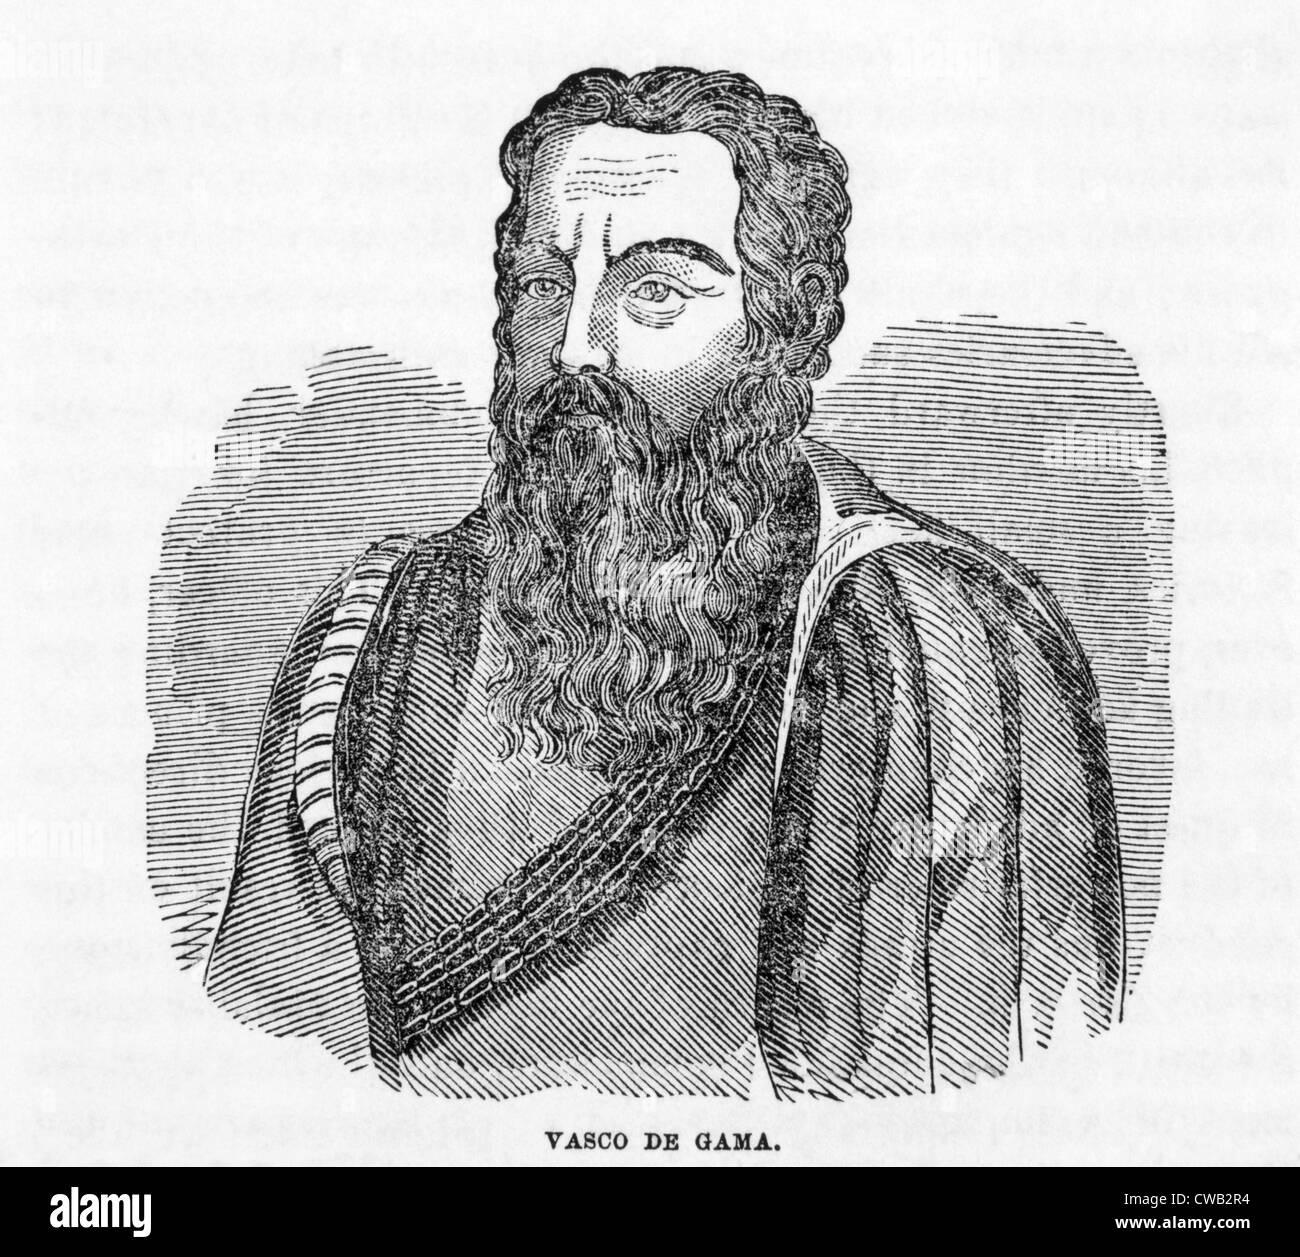 Vasco da Gama (ca. 1469-1524), woodcut engraving 1859 - Stock Image